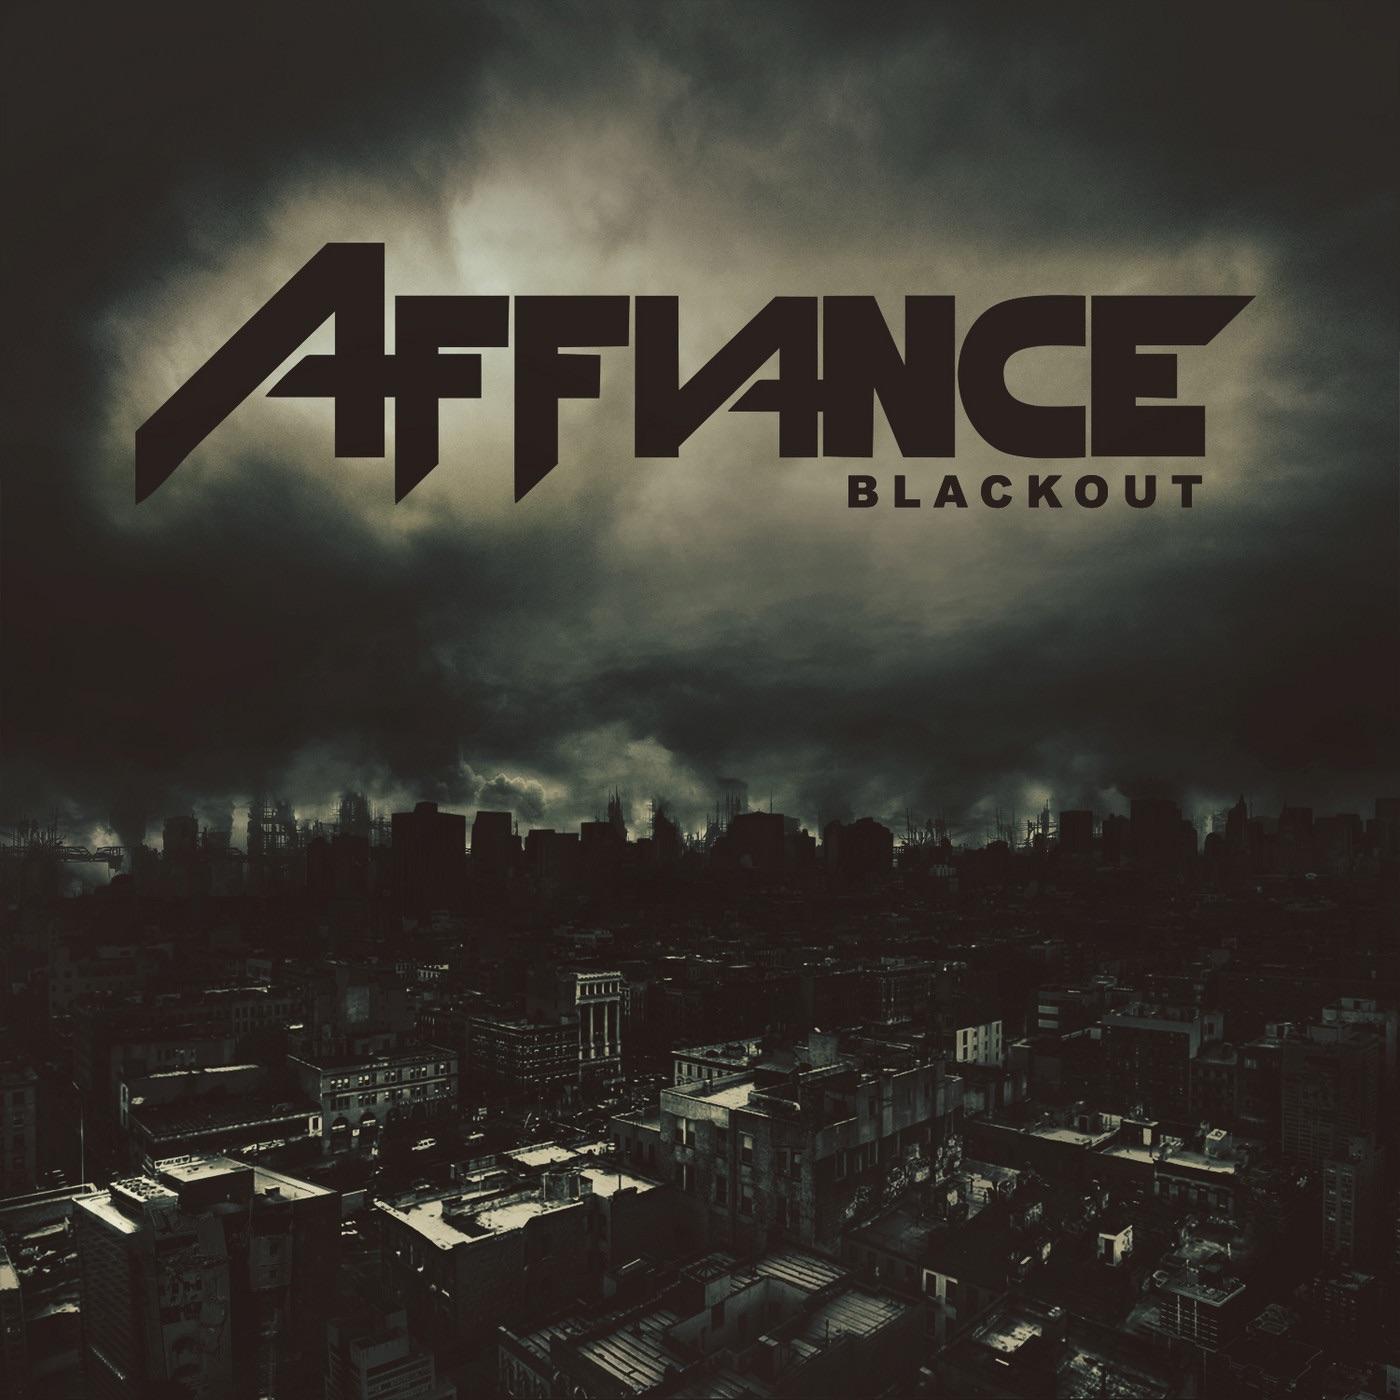 Affiance - Blackout (2014)